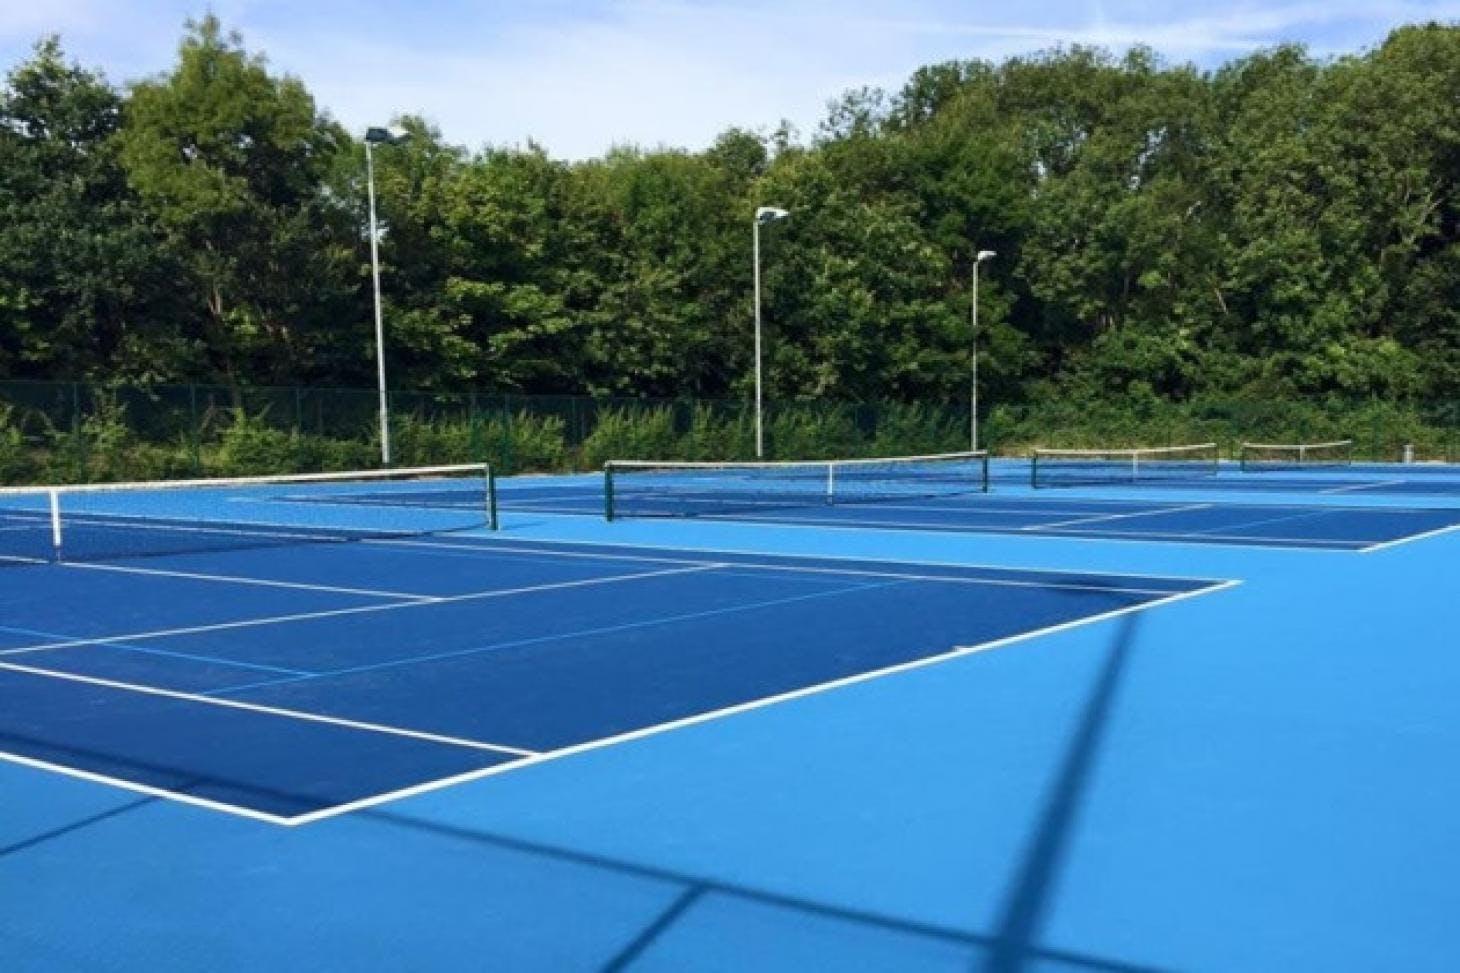 Bromley Tennis Centre Outdoor | Hard (macadam) tennis court